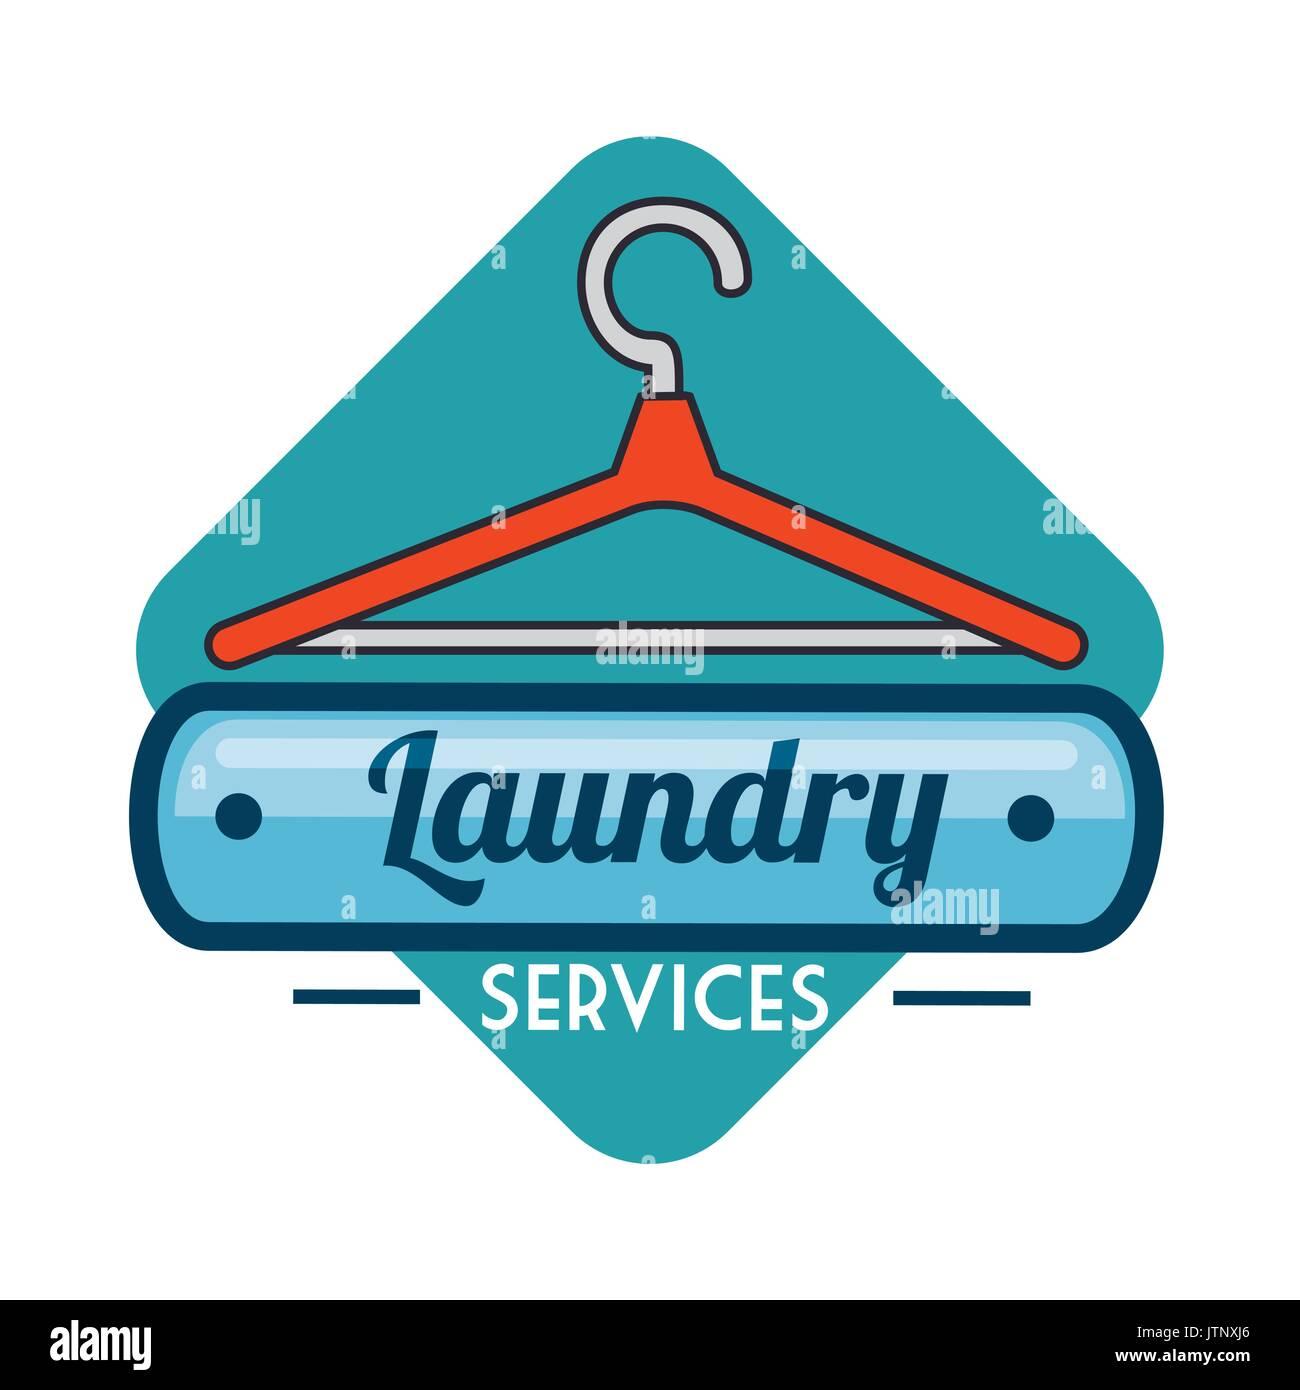 laundry logo emblem badge vector illustration graphic design stock vector image art alamy https www alamy com laundry logo emblem badge vector illustration graphic design image152916574 html